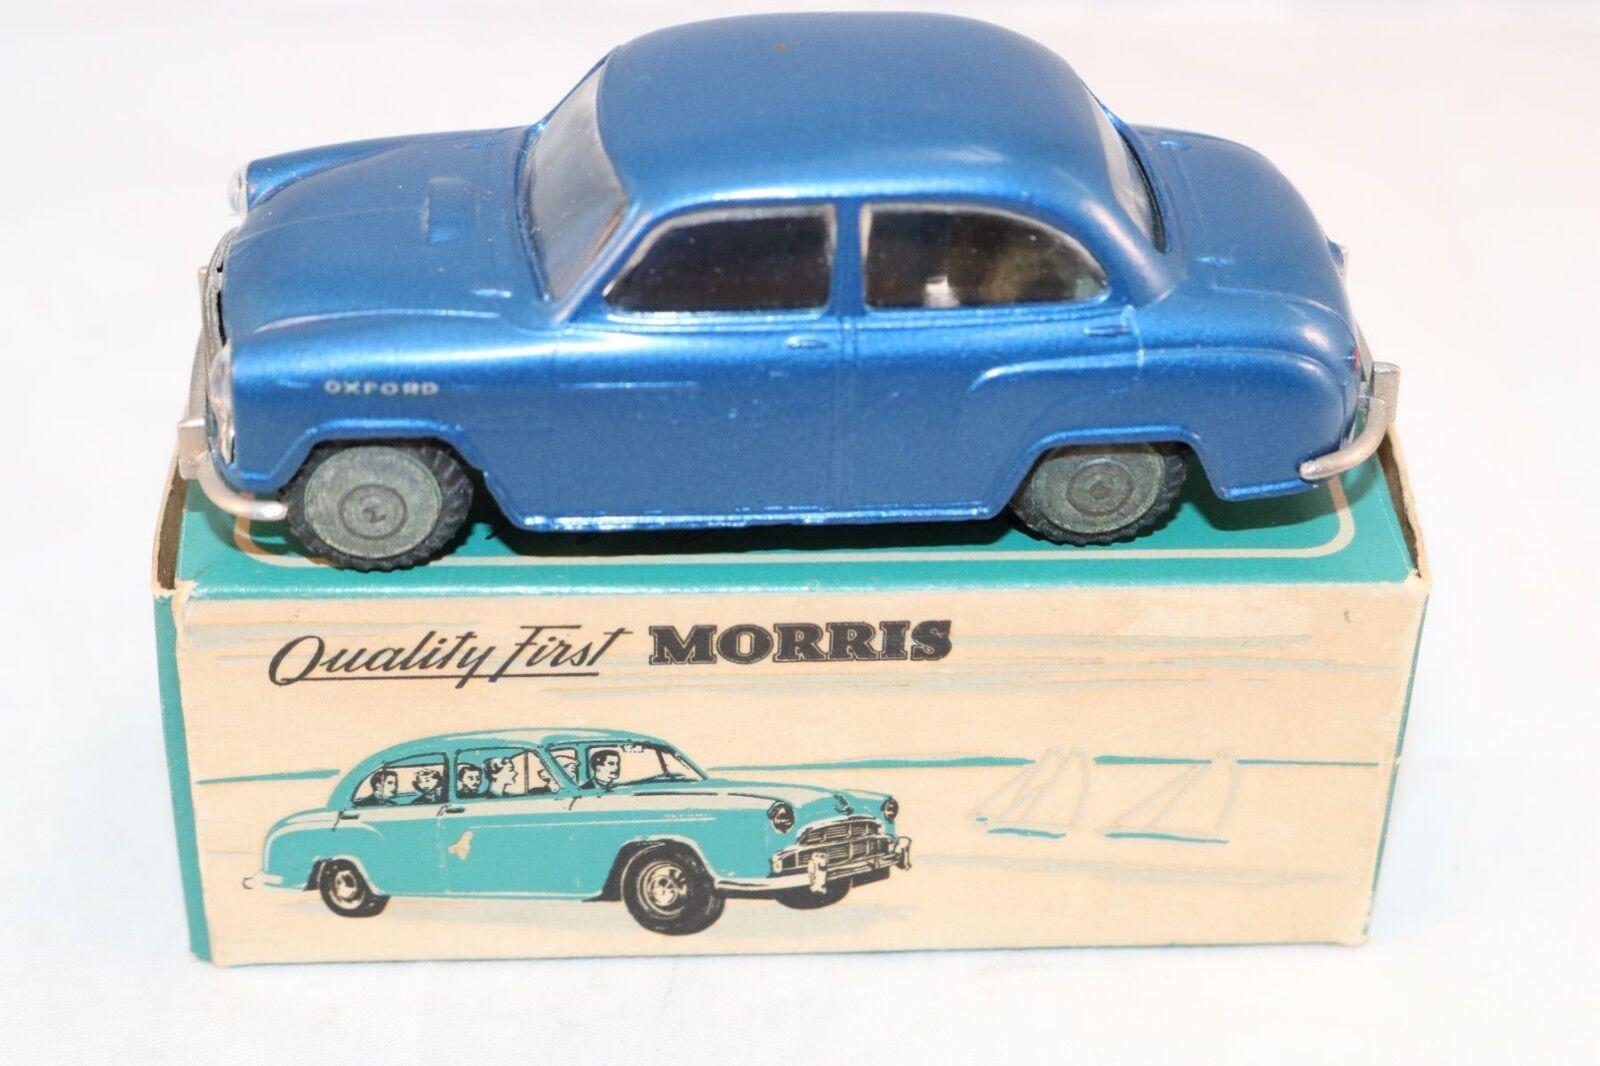 Tekno Denmark 719 Morris Oxford metallic blu 99.9% mint in in in box Superb a beauty b9337b